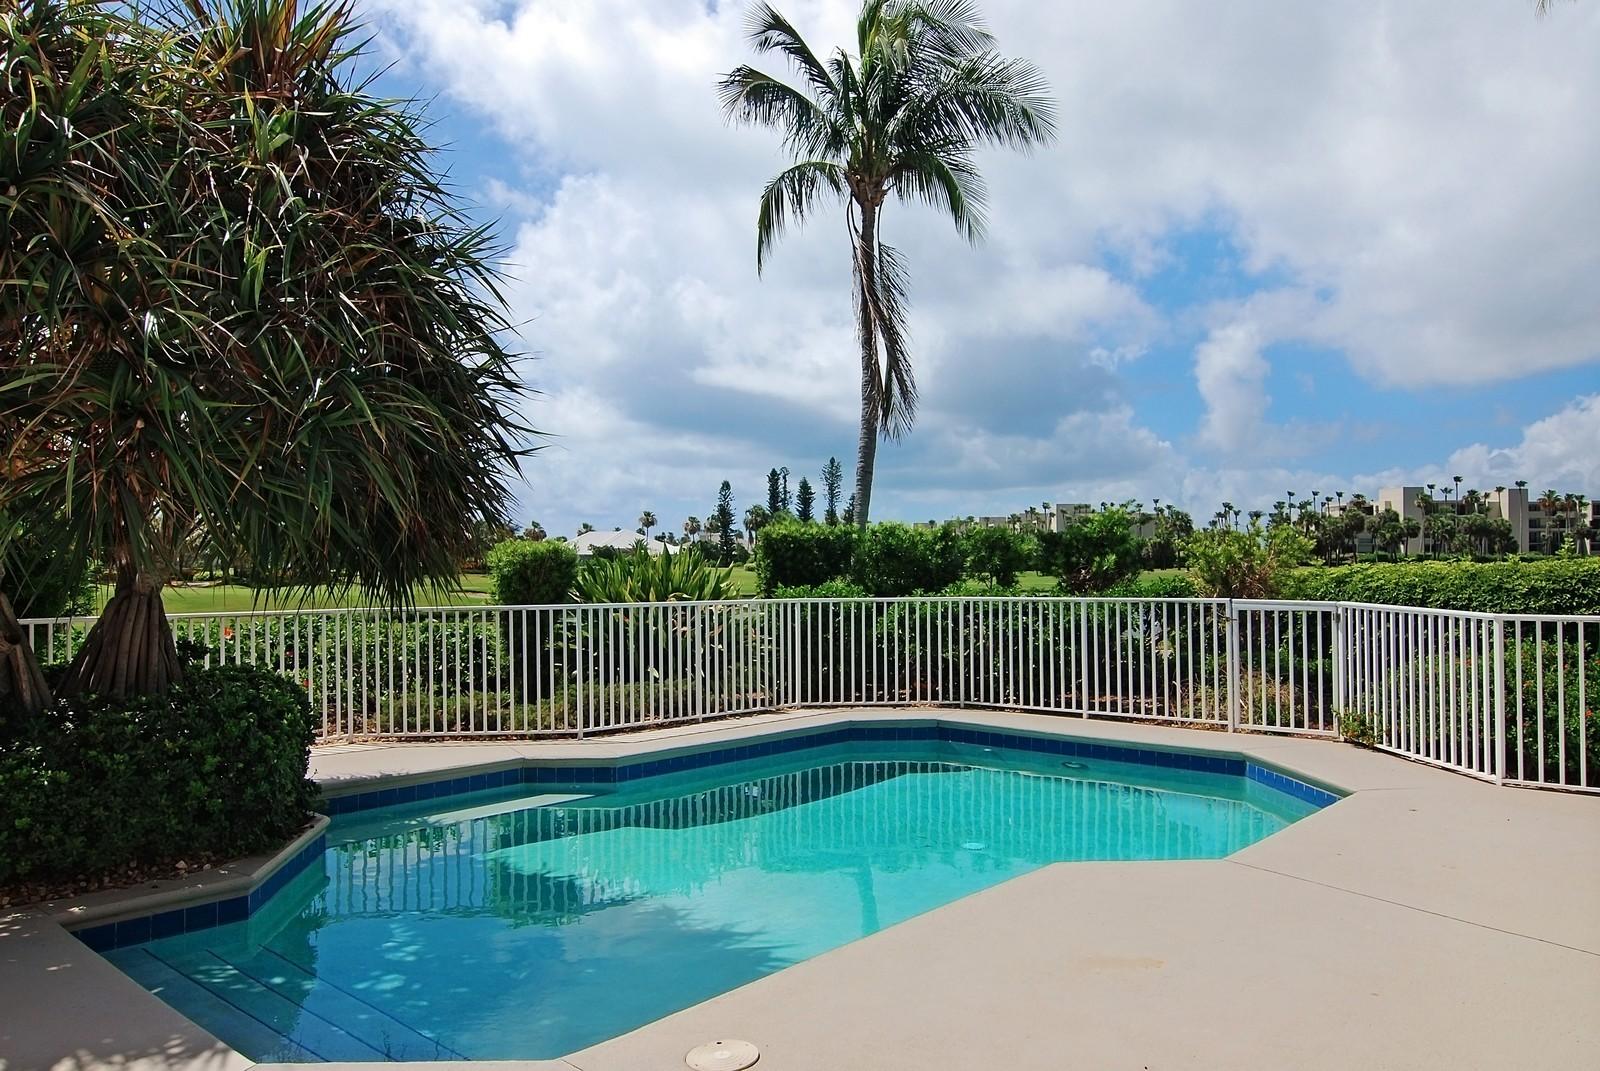 Real Estate Photography - 7000 SE Lakeview, Stuart, FL, 34996 - Pool